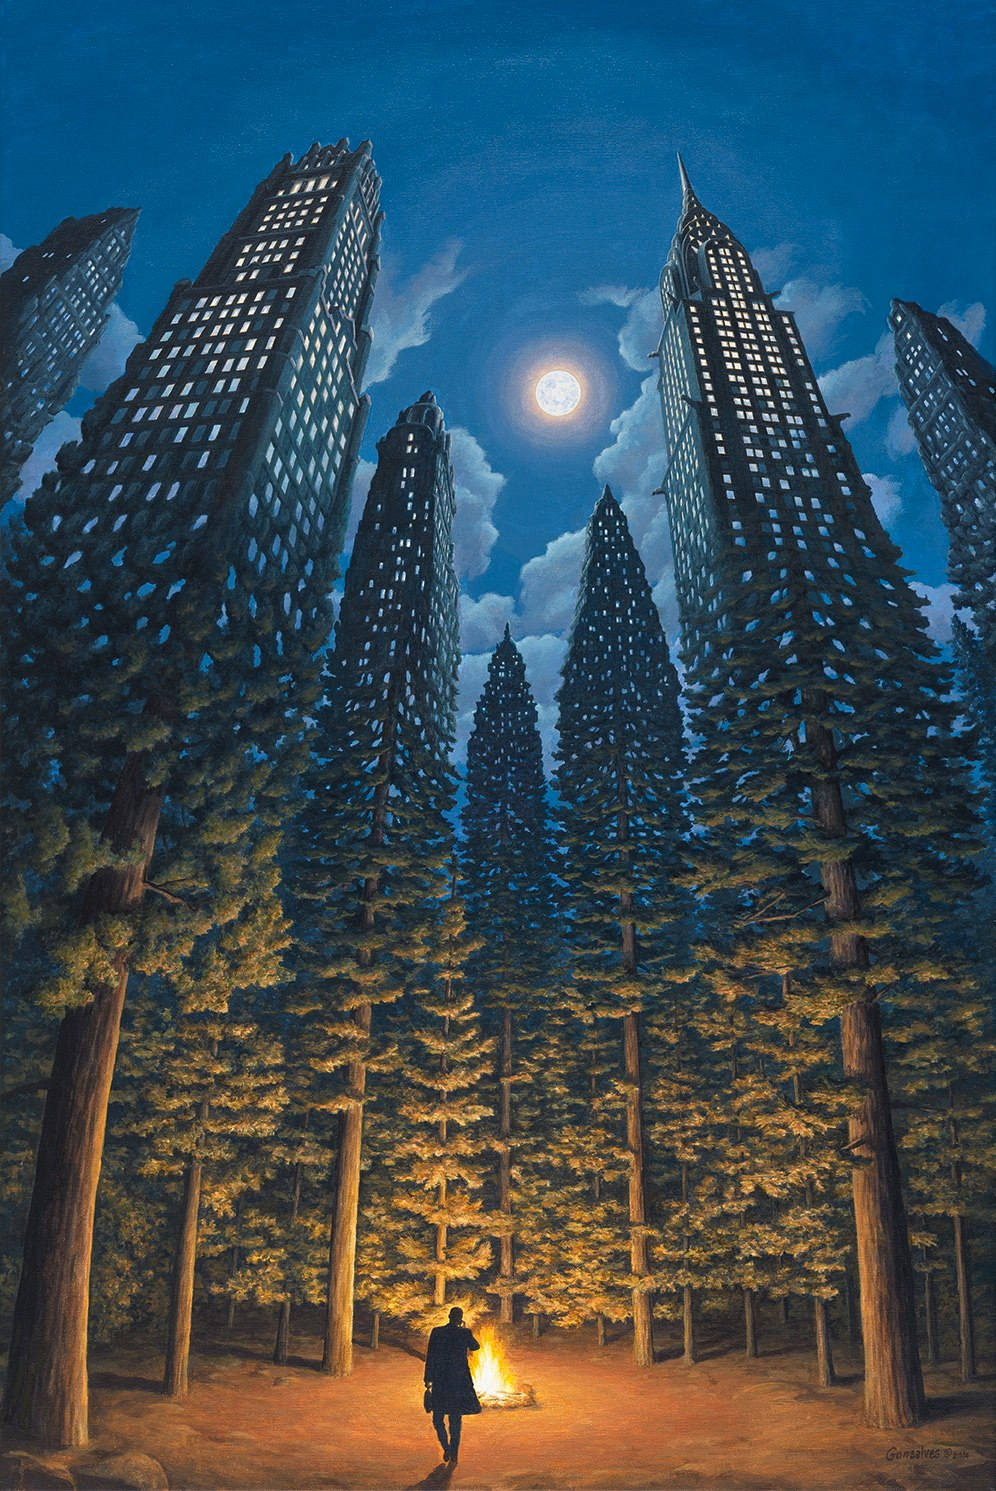 Optical Illusion Paintings by Artist Robert Gonsalves – BOOOOOOOM! – CREATE * INSPIRE * COMMUNITY * ART * DESIGN * MUSIC * FILM * PHOTO * PROJECTS